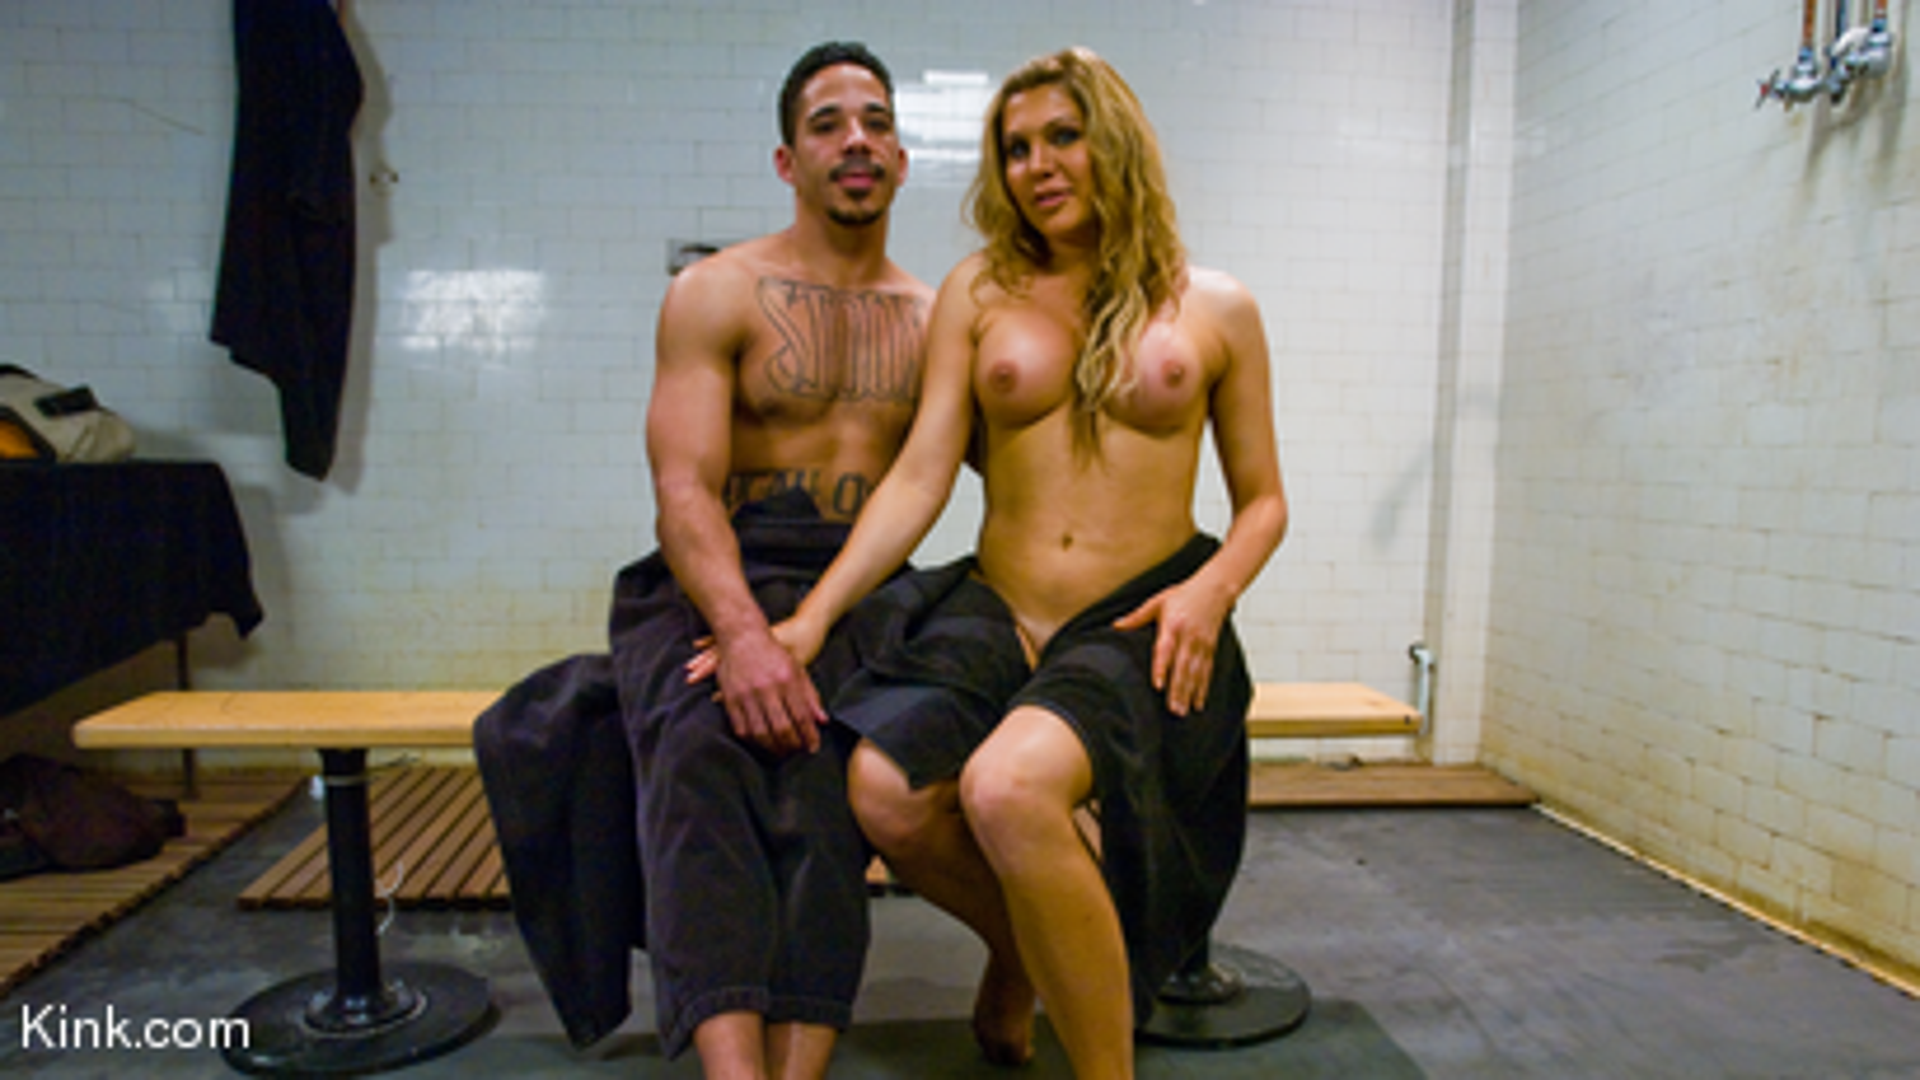 Photo number 27 from Carmen Cruz: Seduction in the Shower shot for TS Seduction on Kink.com. Featuring Carmen Cruz and Lobo in hardcore BDSM & Fetish porn.